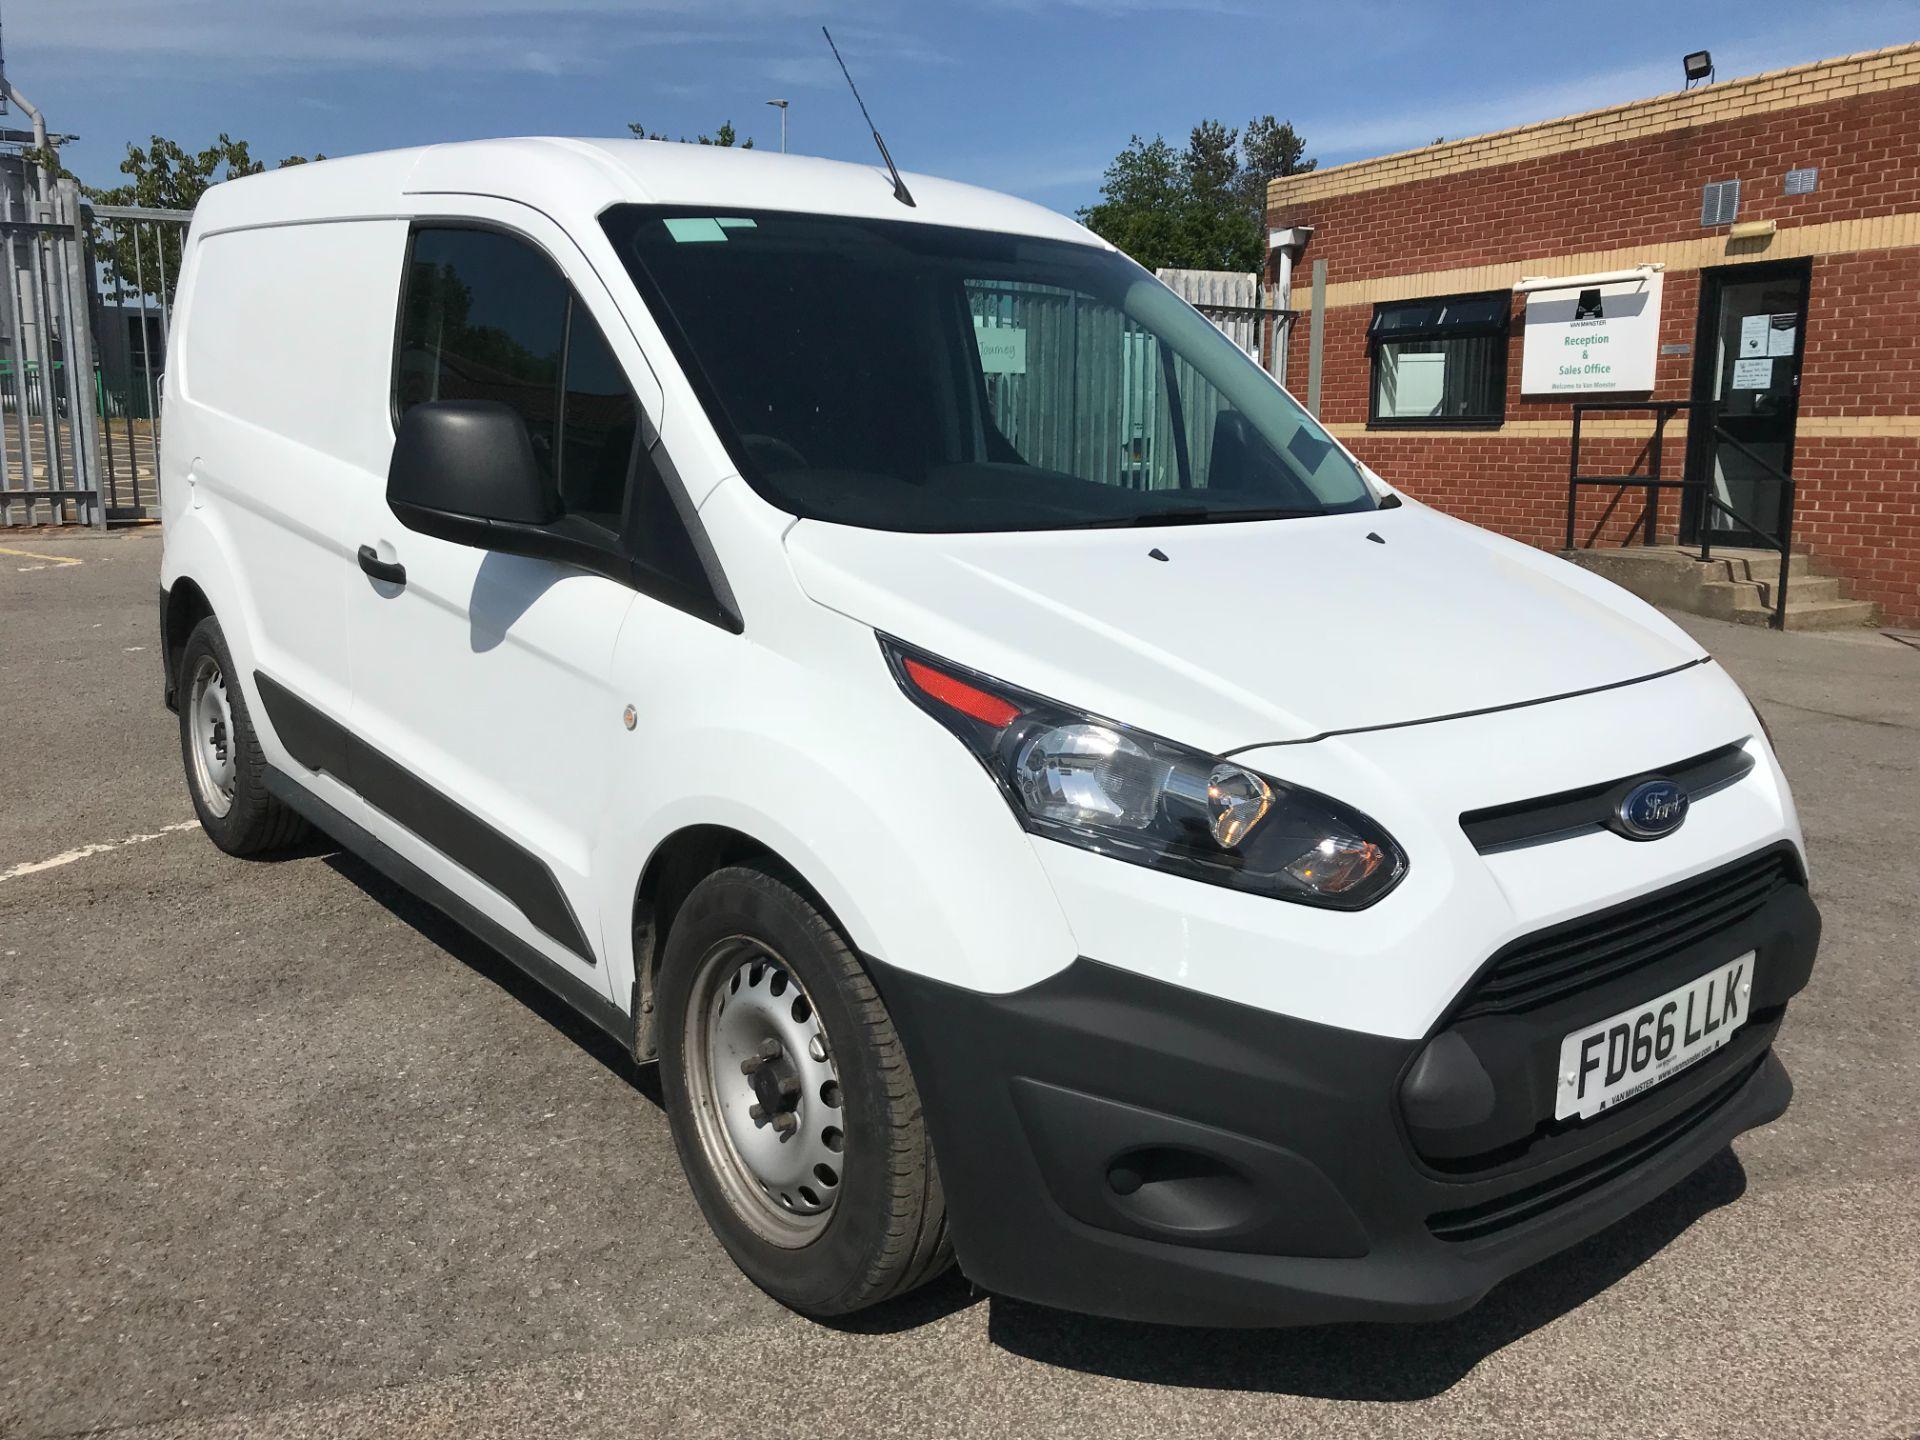 2016 Ford Transit Connect 1.5 Tdci 75Ps Van (FD66LLK)